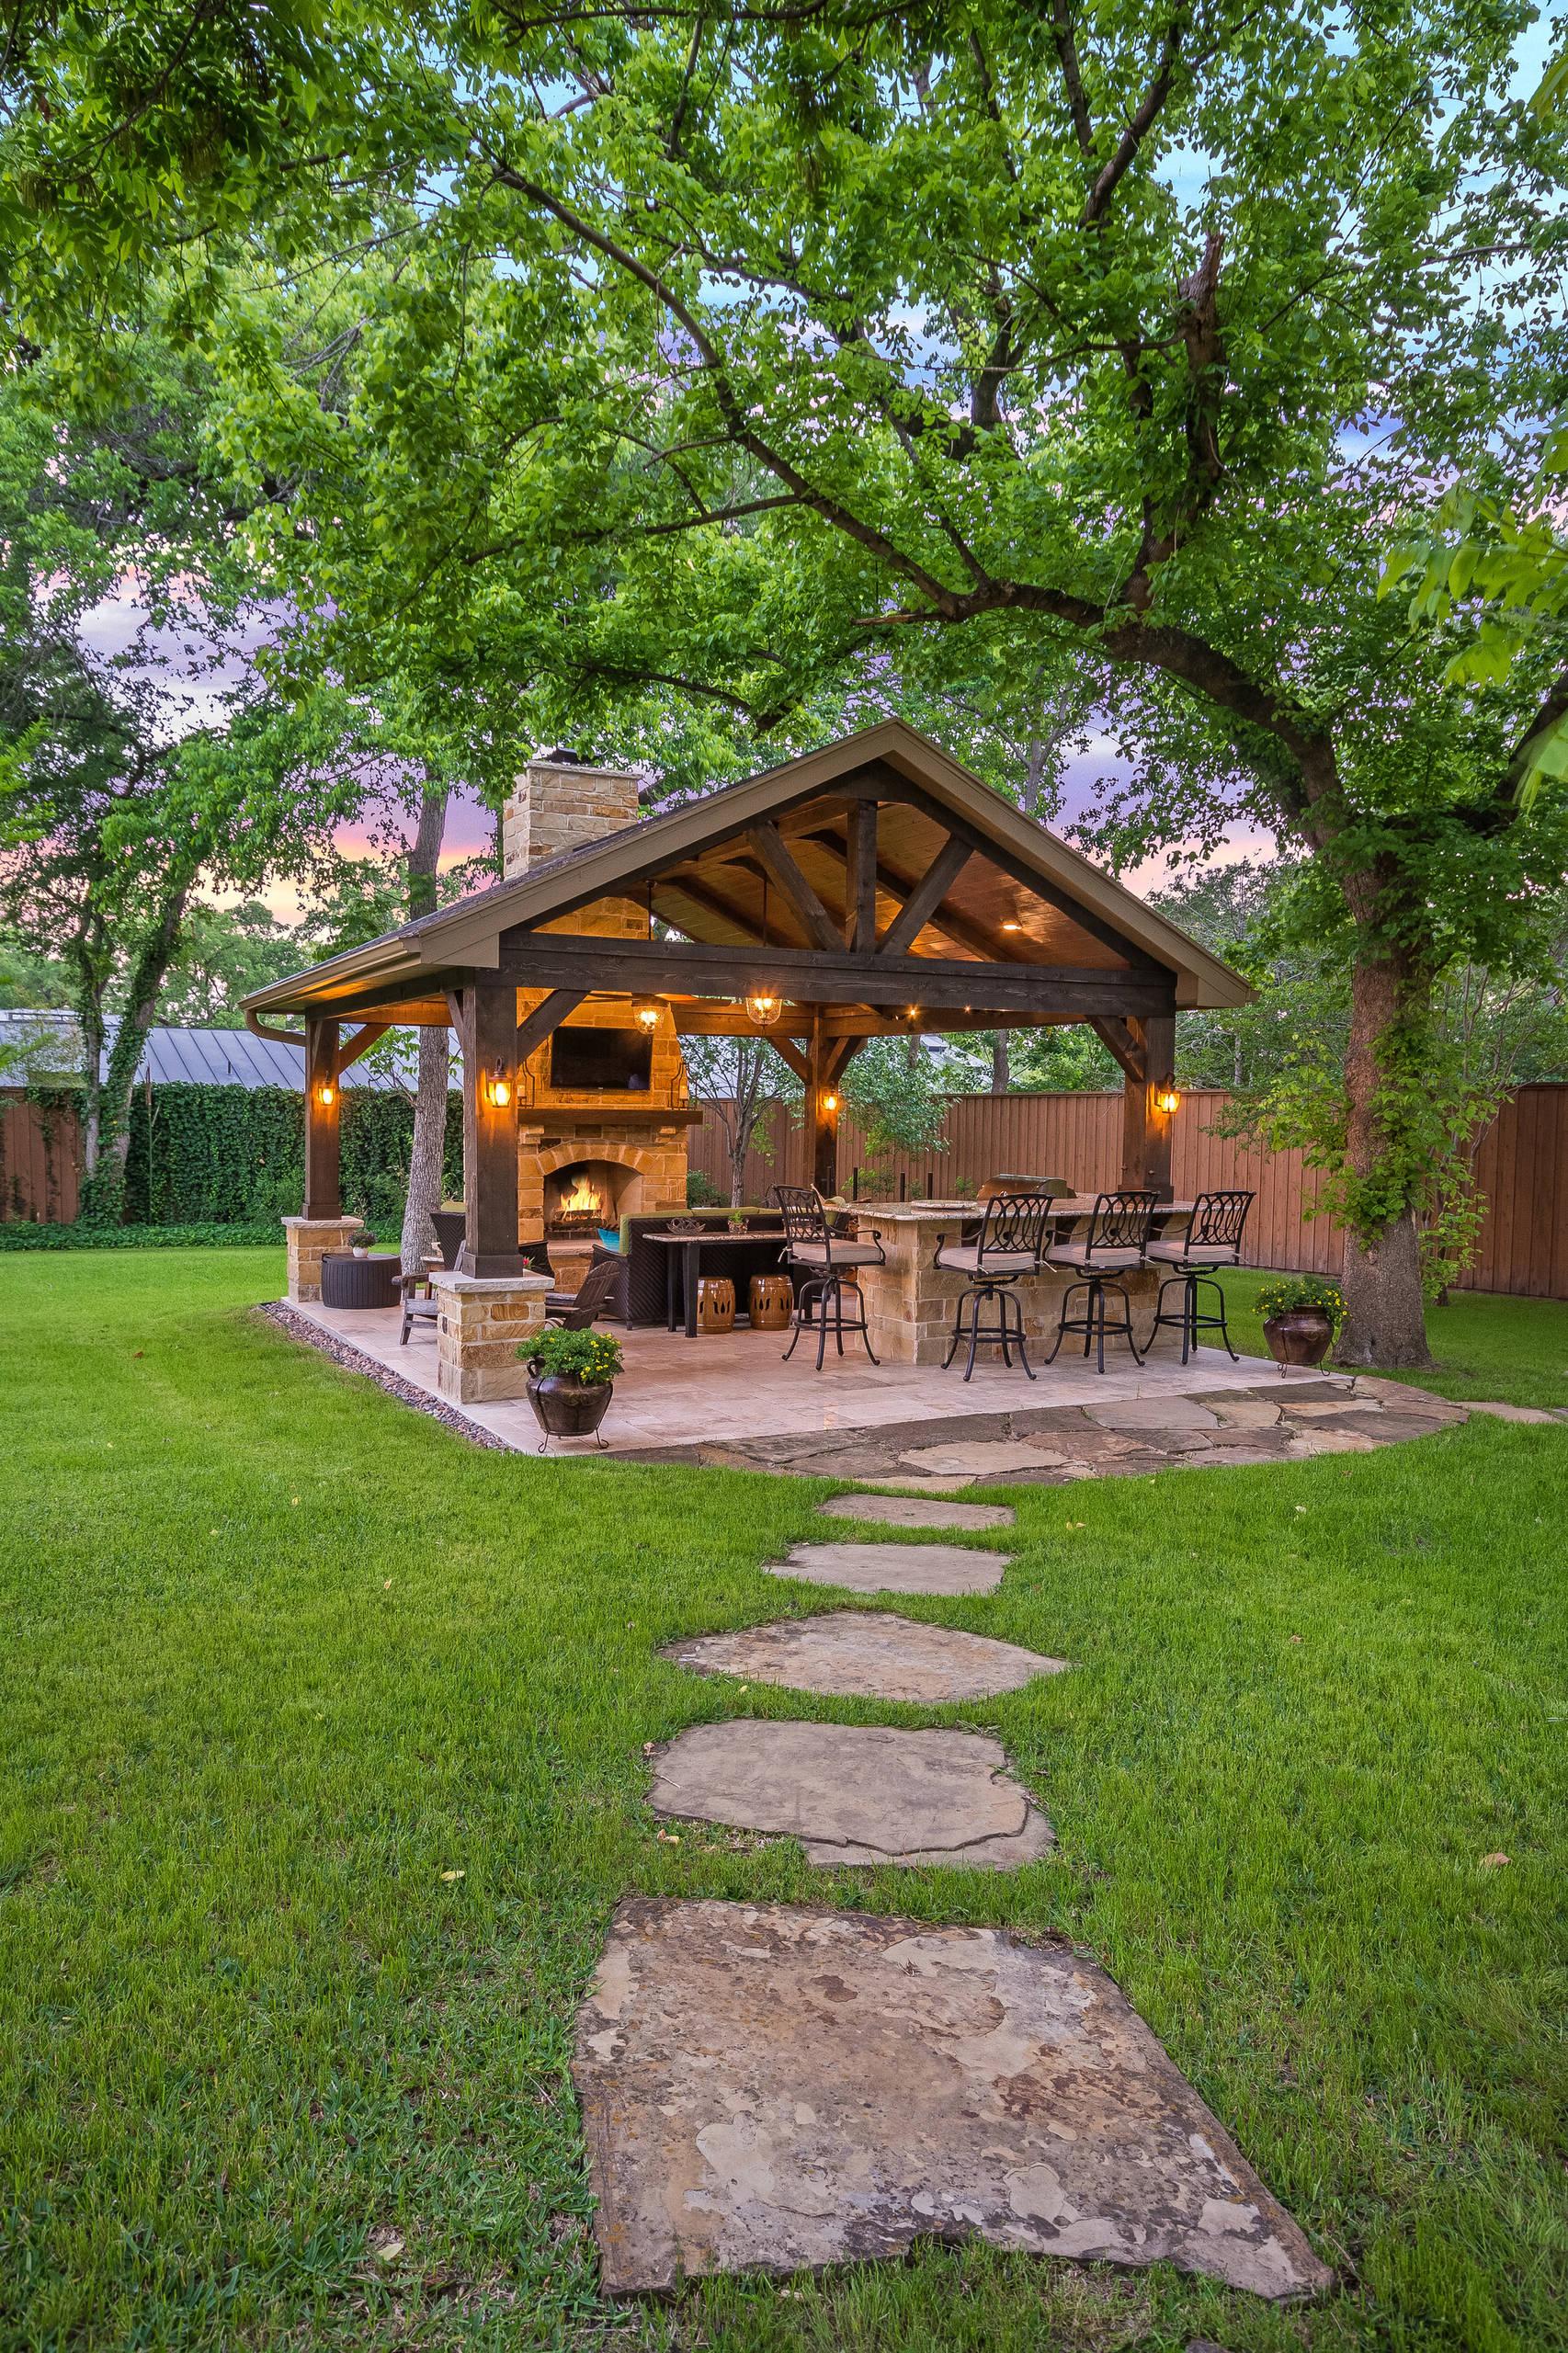 75 Beautiful Backyard Patio Design Ideas Pictures Houzz